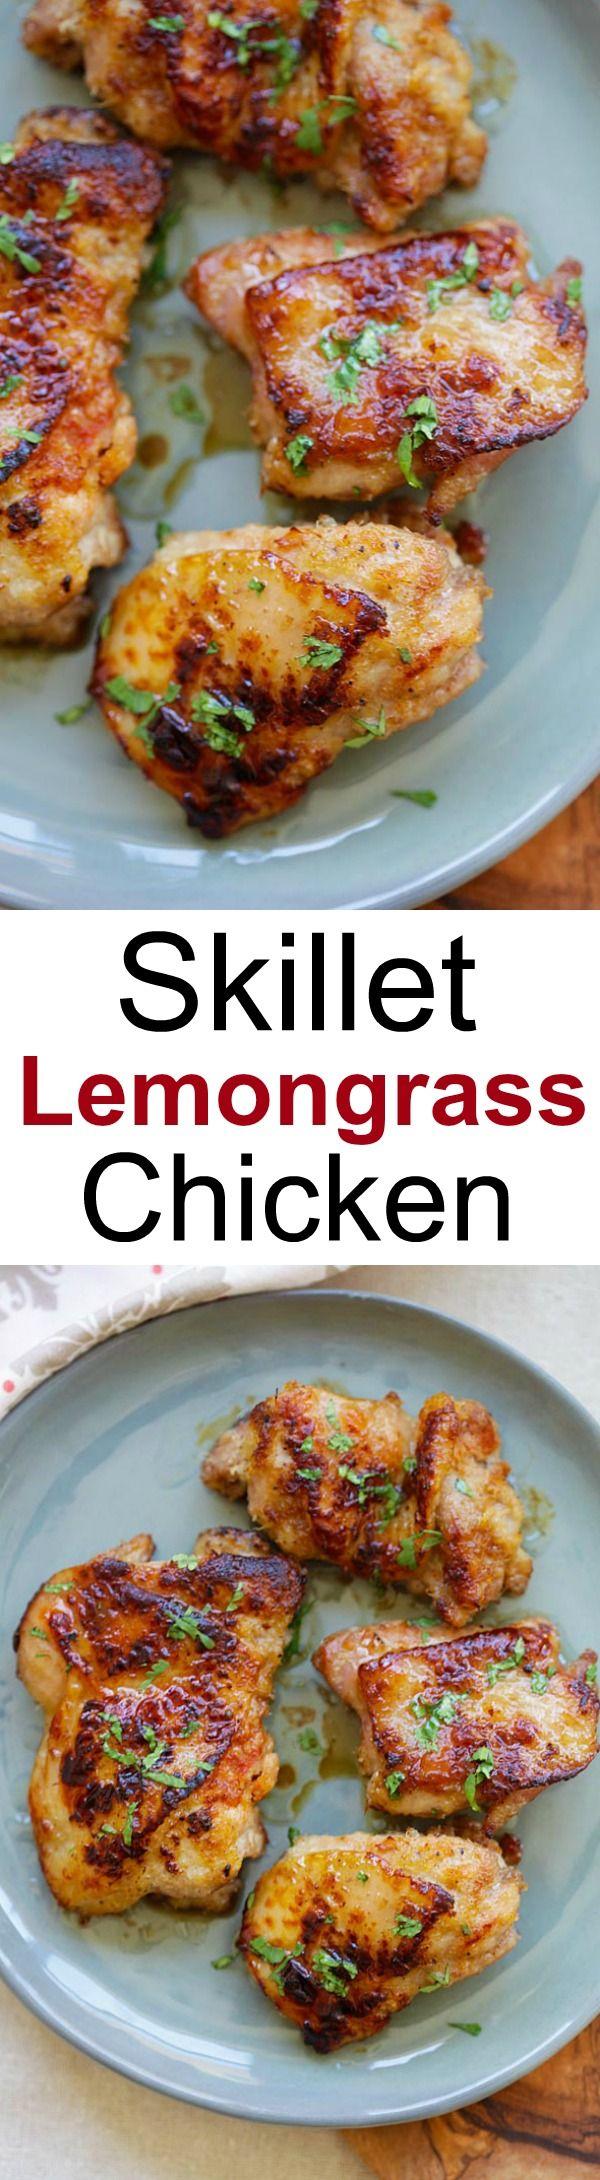 Skillet Lemongrass Chicken – best and easy skillet chicken recipe. Marinate with lemongrass, salt, honey, pan-fried & dinner is ready   rasamalaysia.com